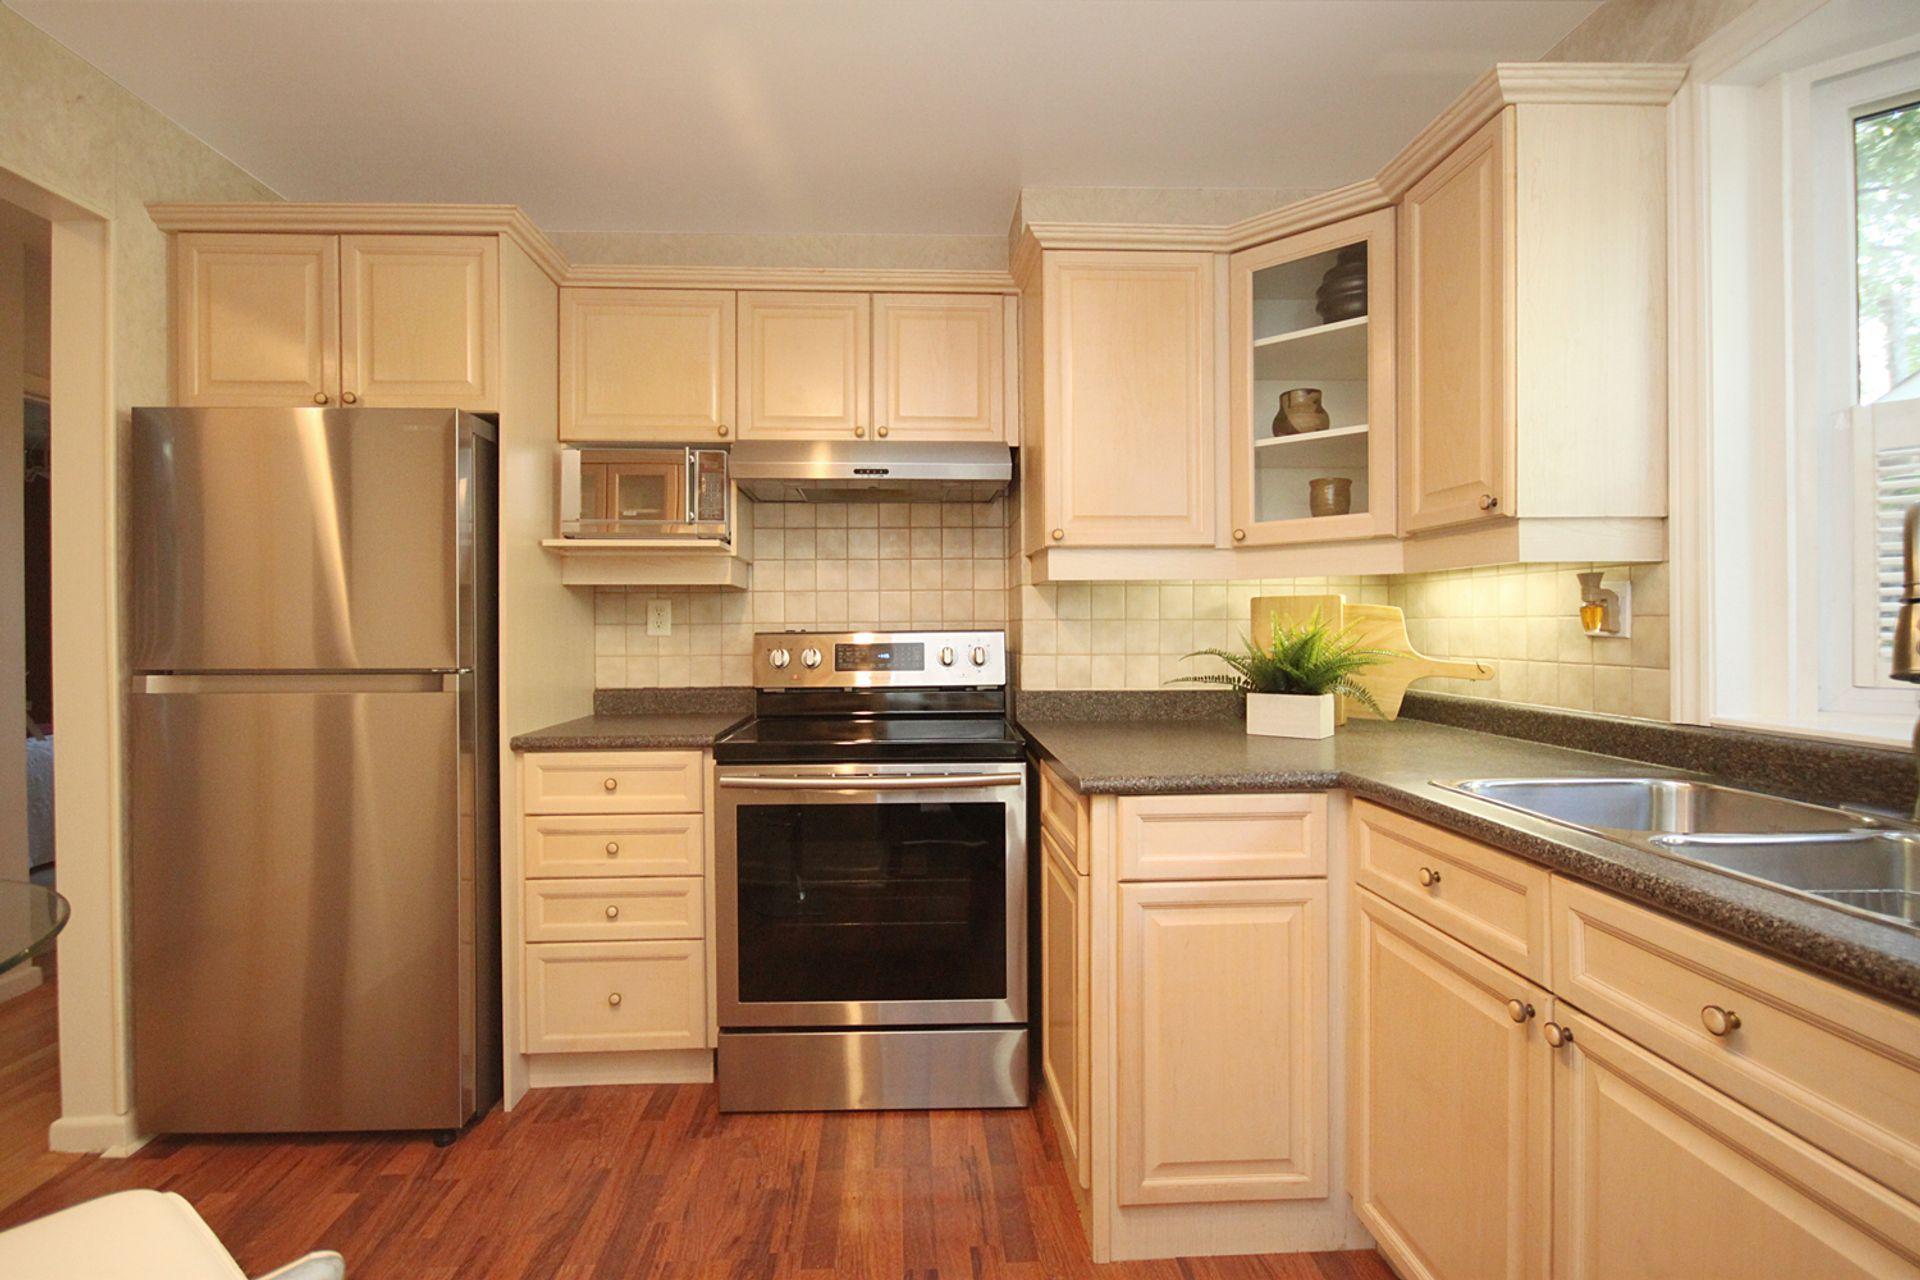 Kitchen at 33 Combermere Drive, Parkwoods-Donalda, Toronto